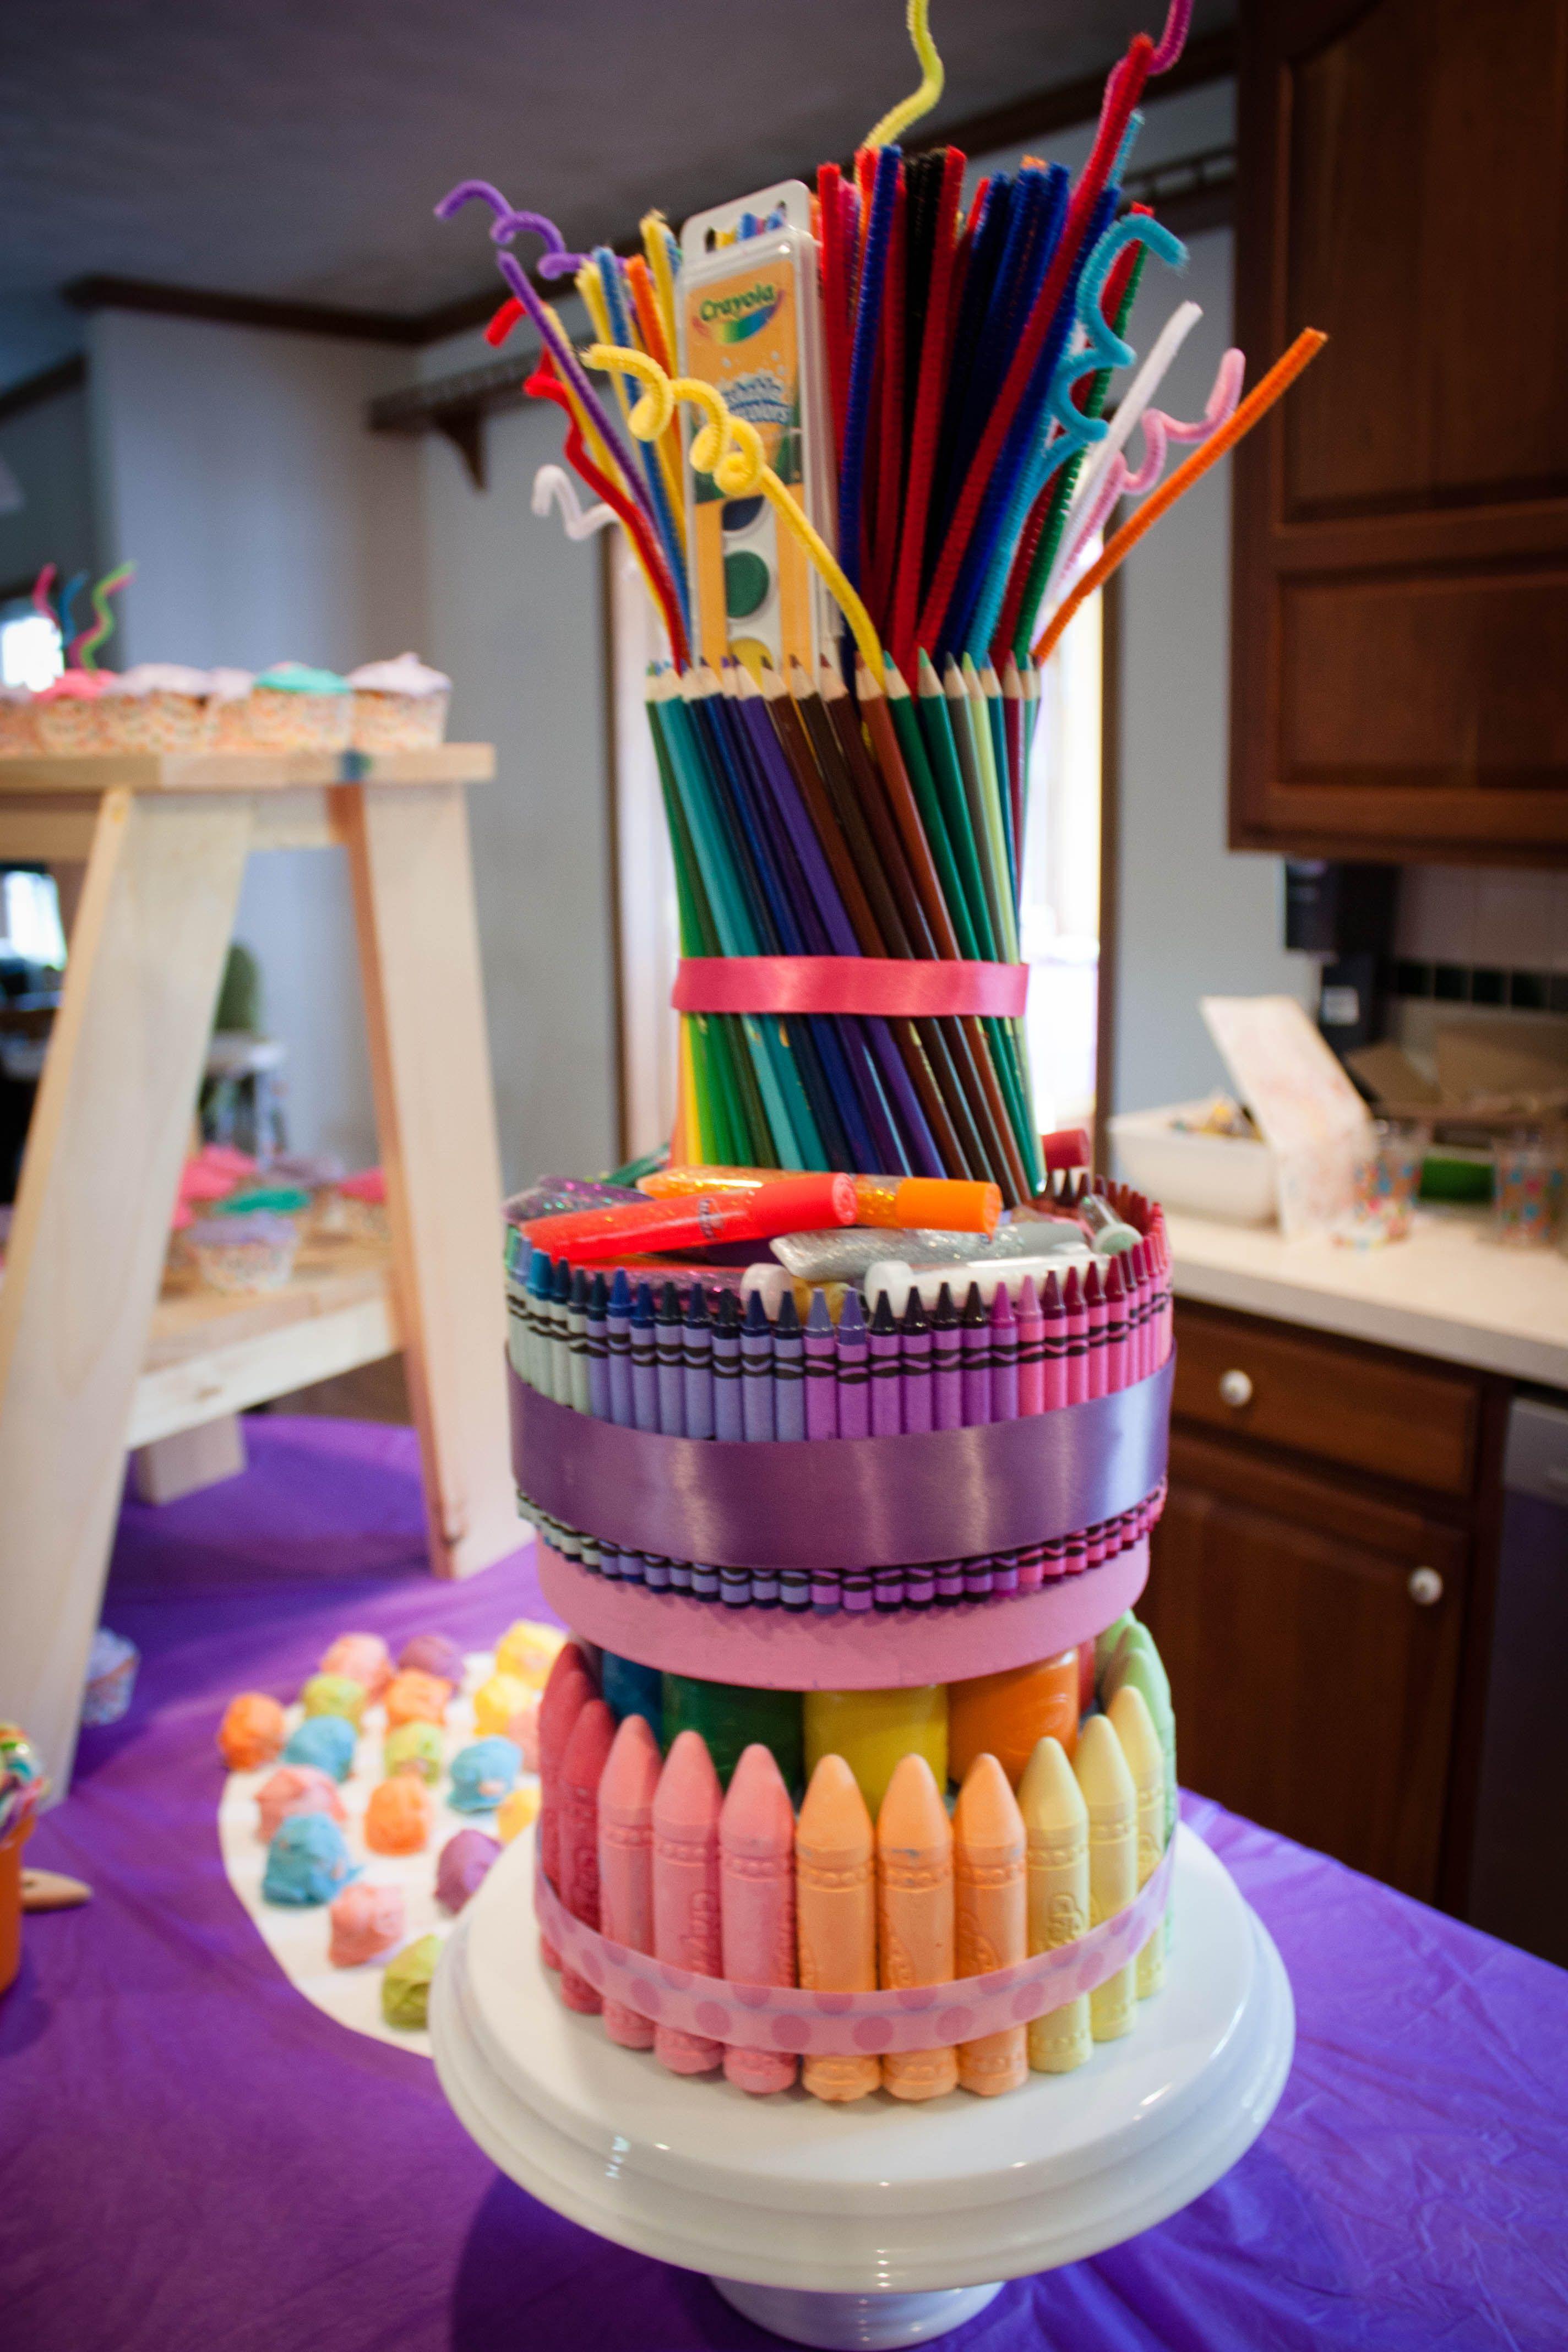 Cake Art Supplies : Art supply cake centerpiece My Style Pinterest